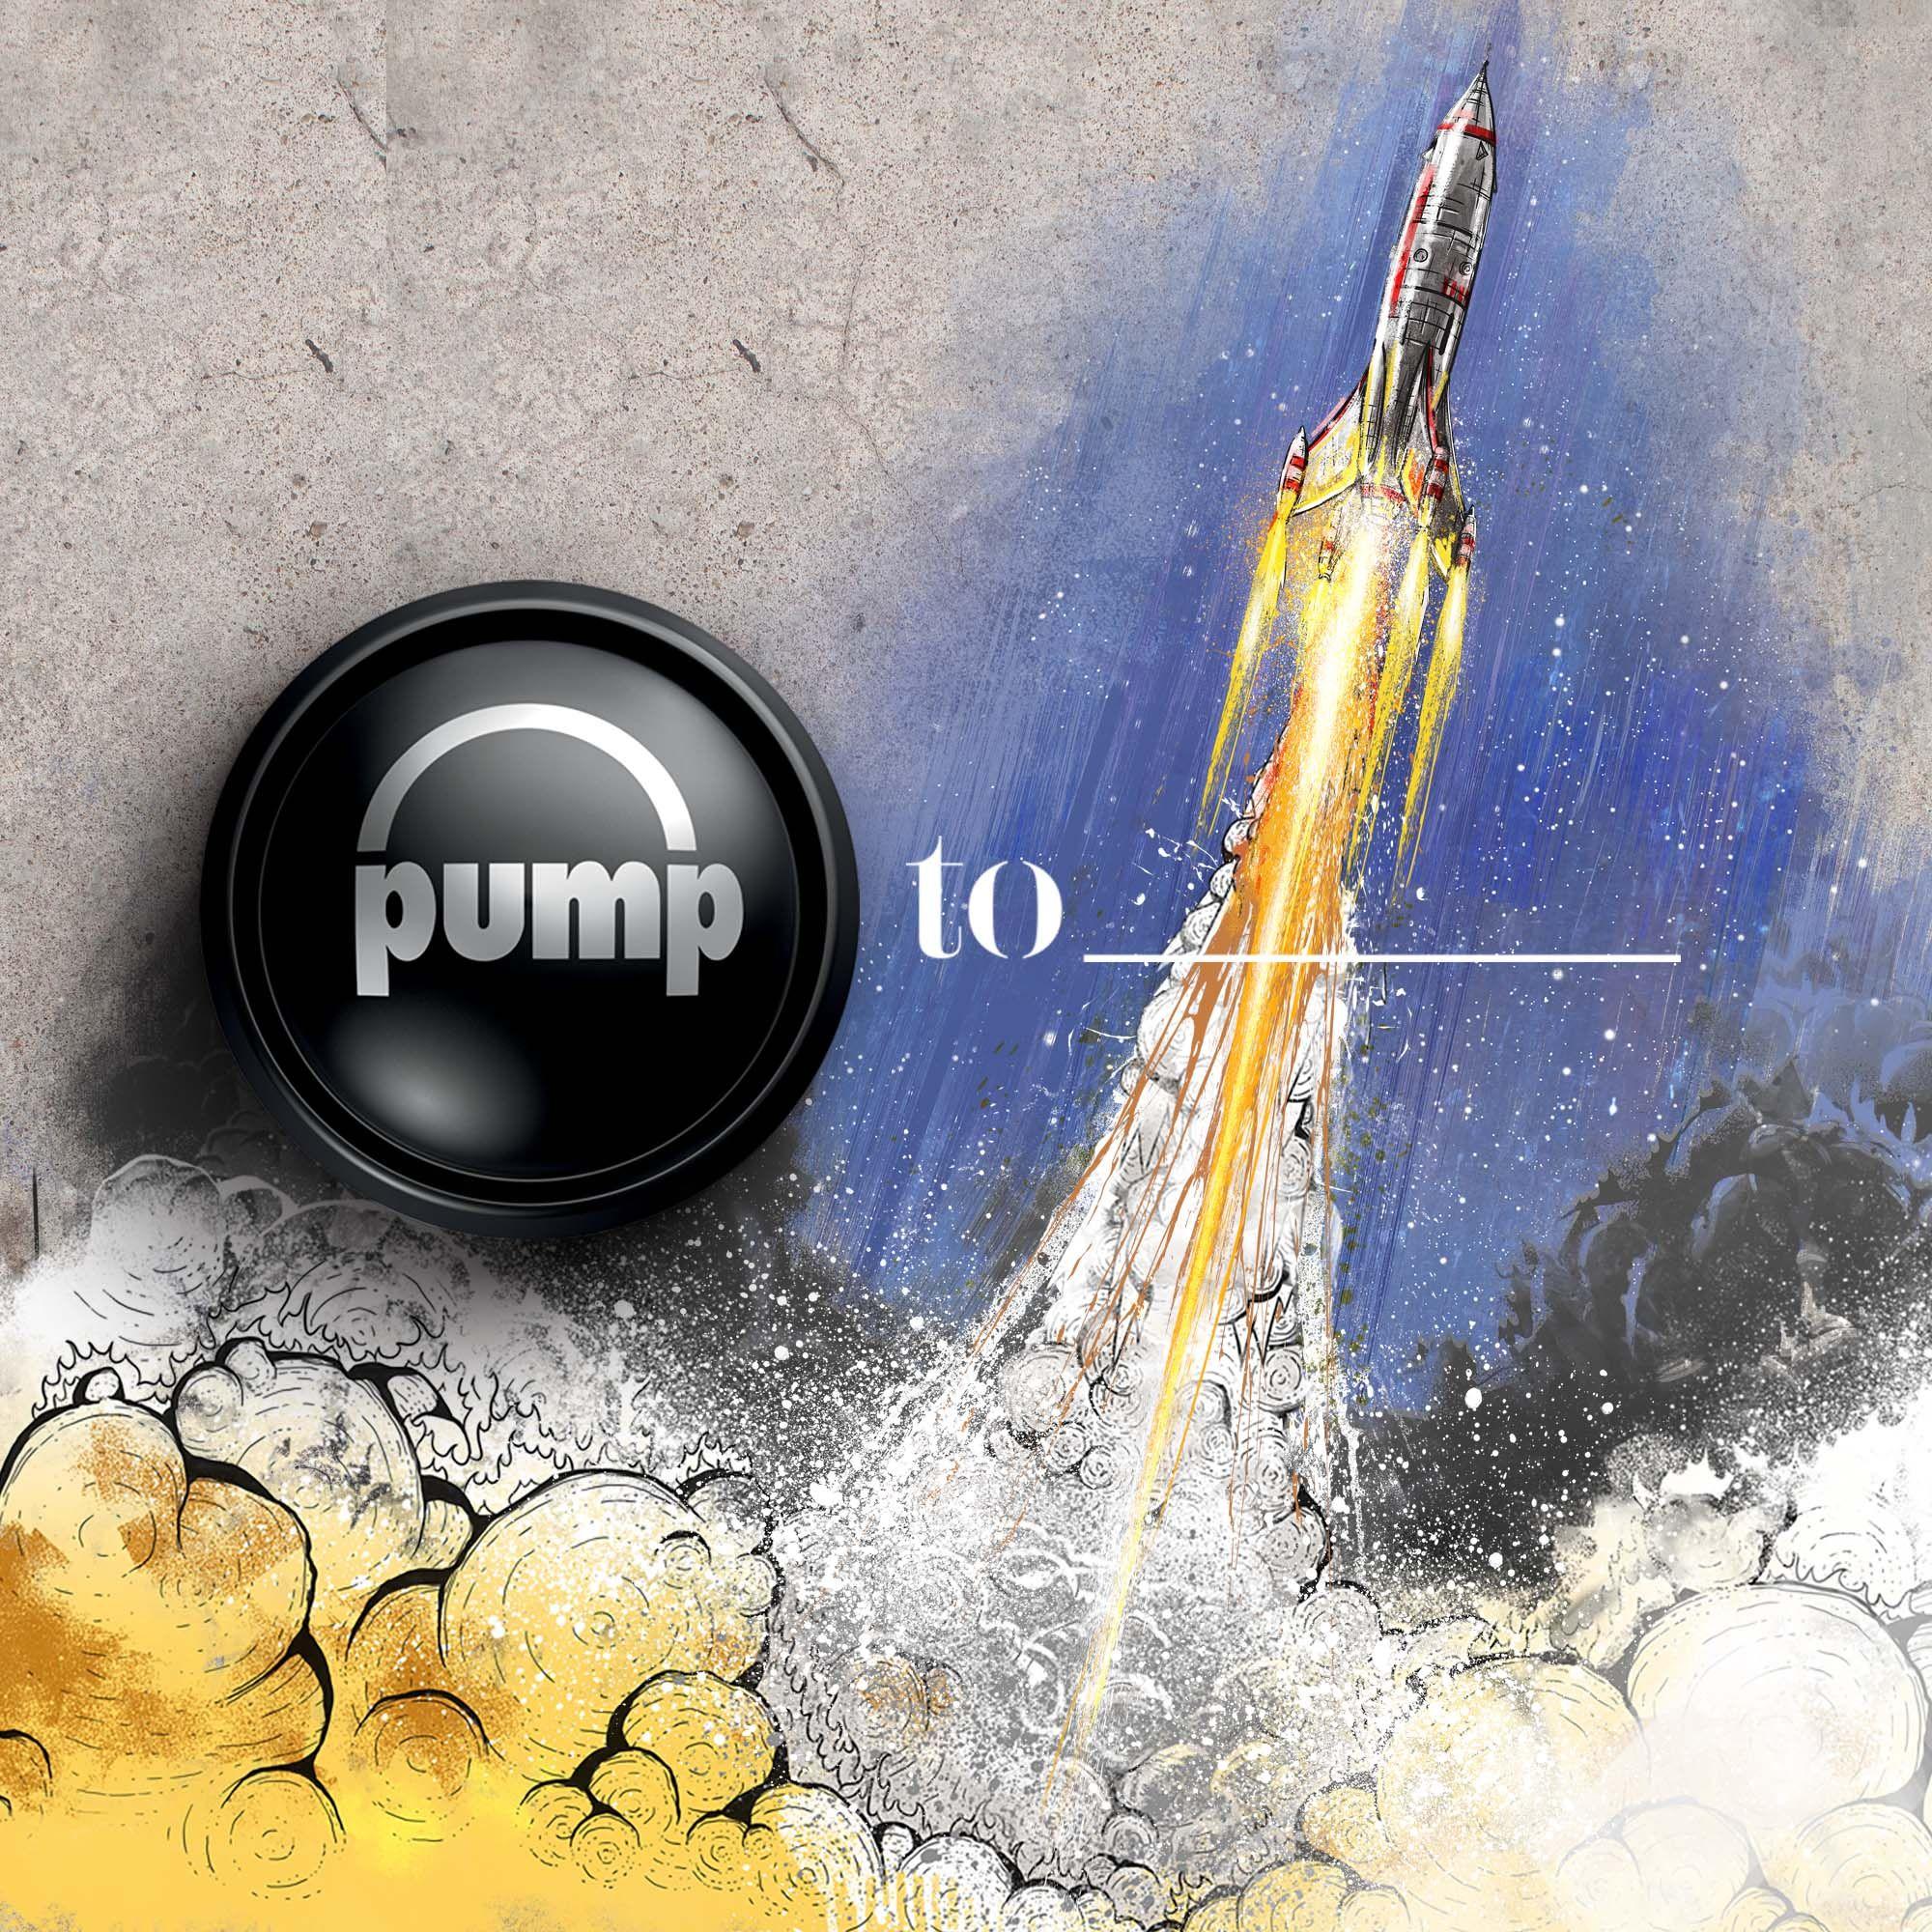 Pump za eksploziju. Pump stvoren za tebe.www.reebok-zpump-fusion.rs ... dfbcecdbf1